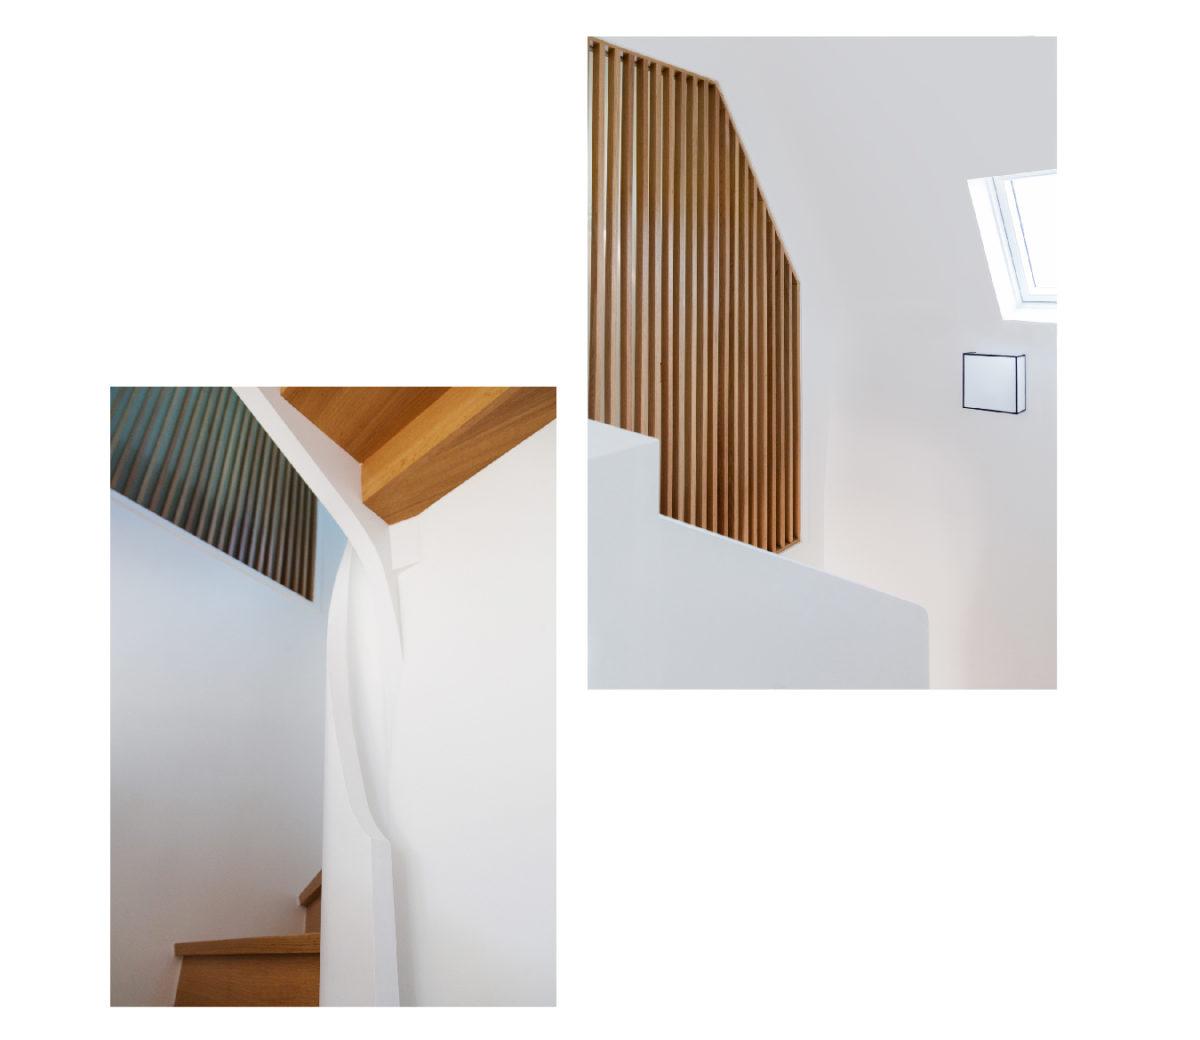 montparnasse_escalierx